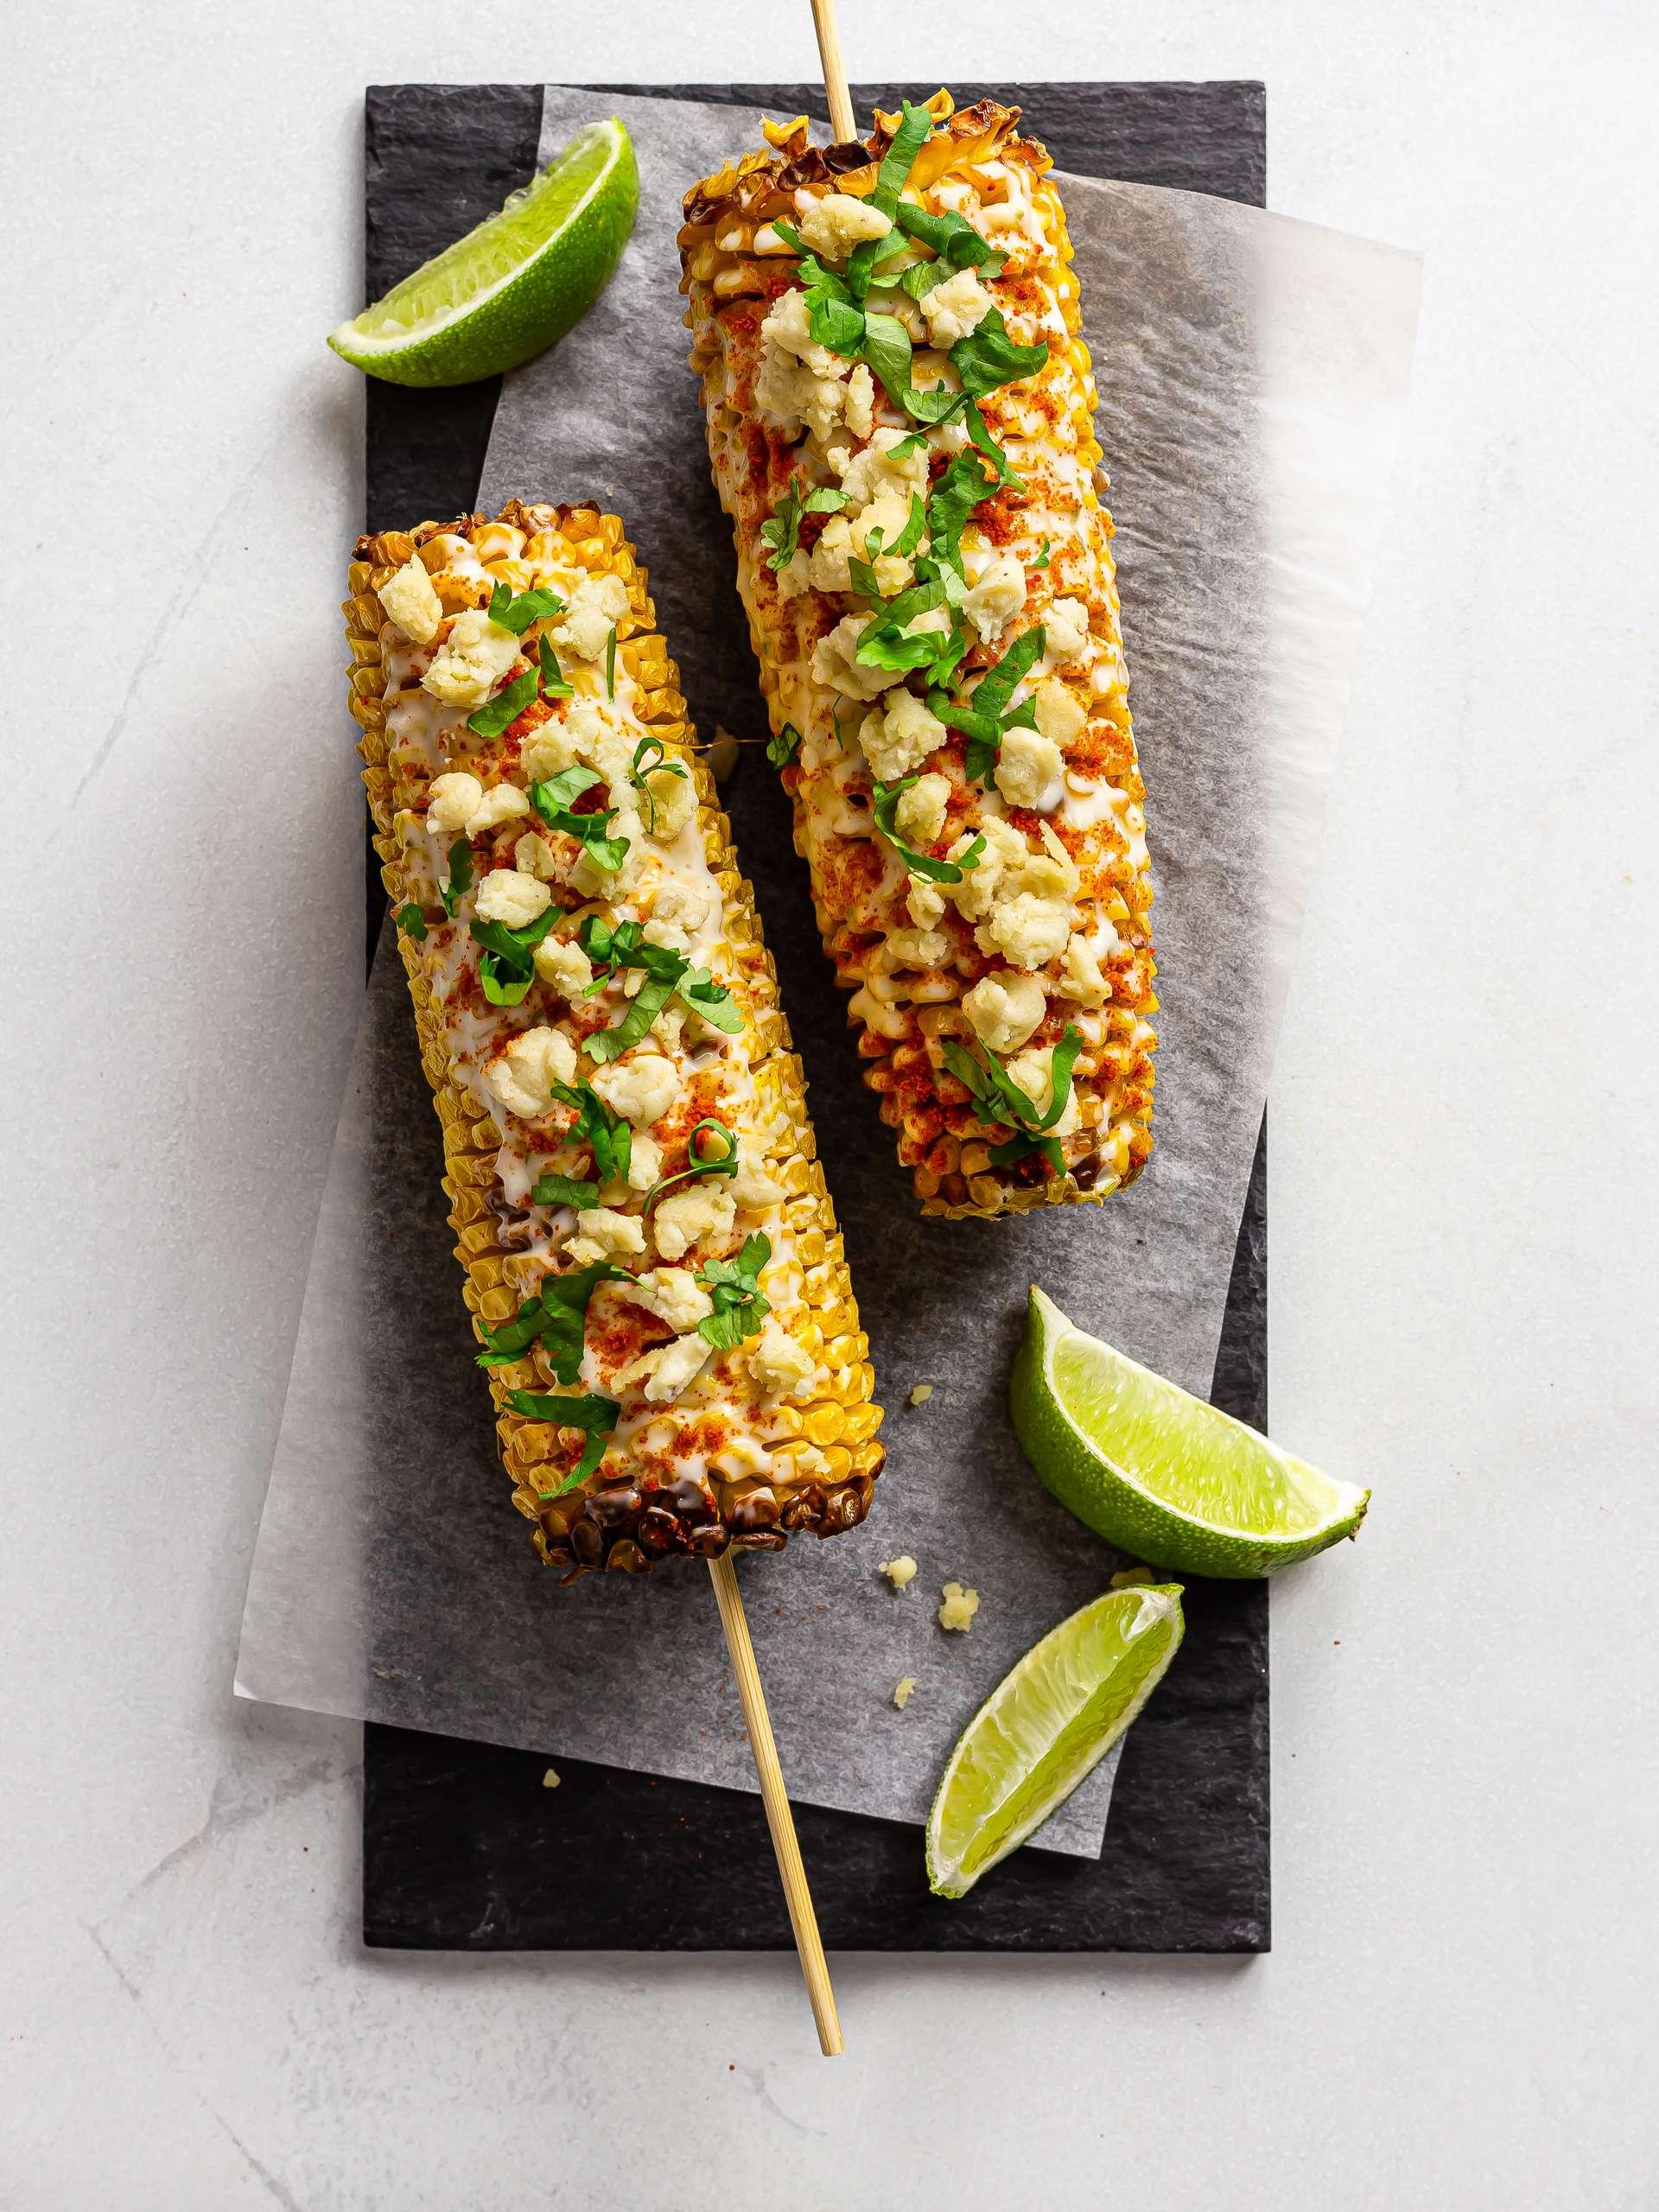 Vegan Elote (Mexican Grilled Street Corn)